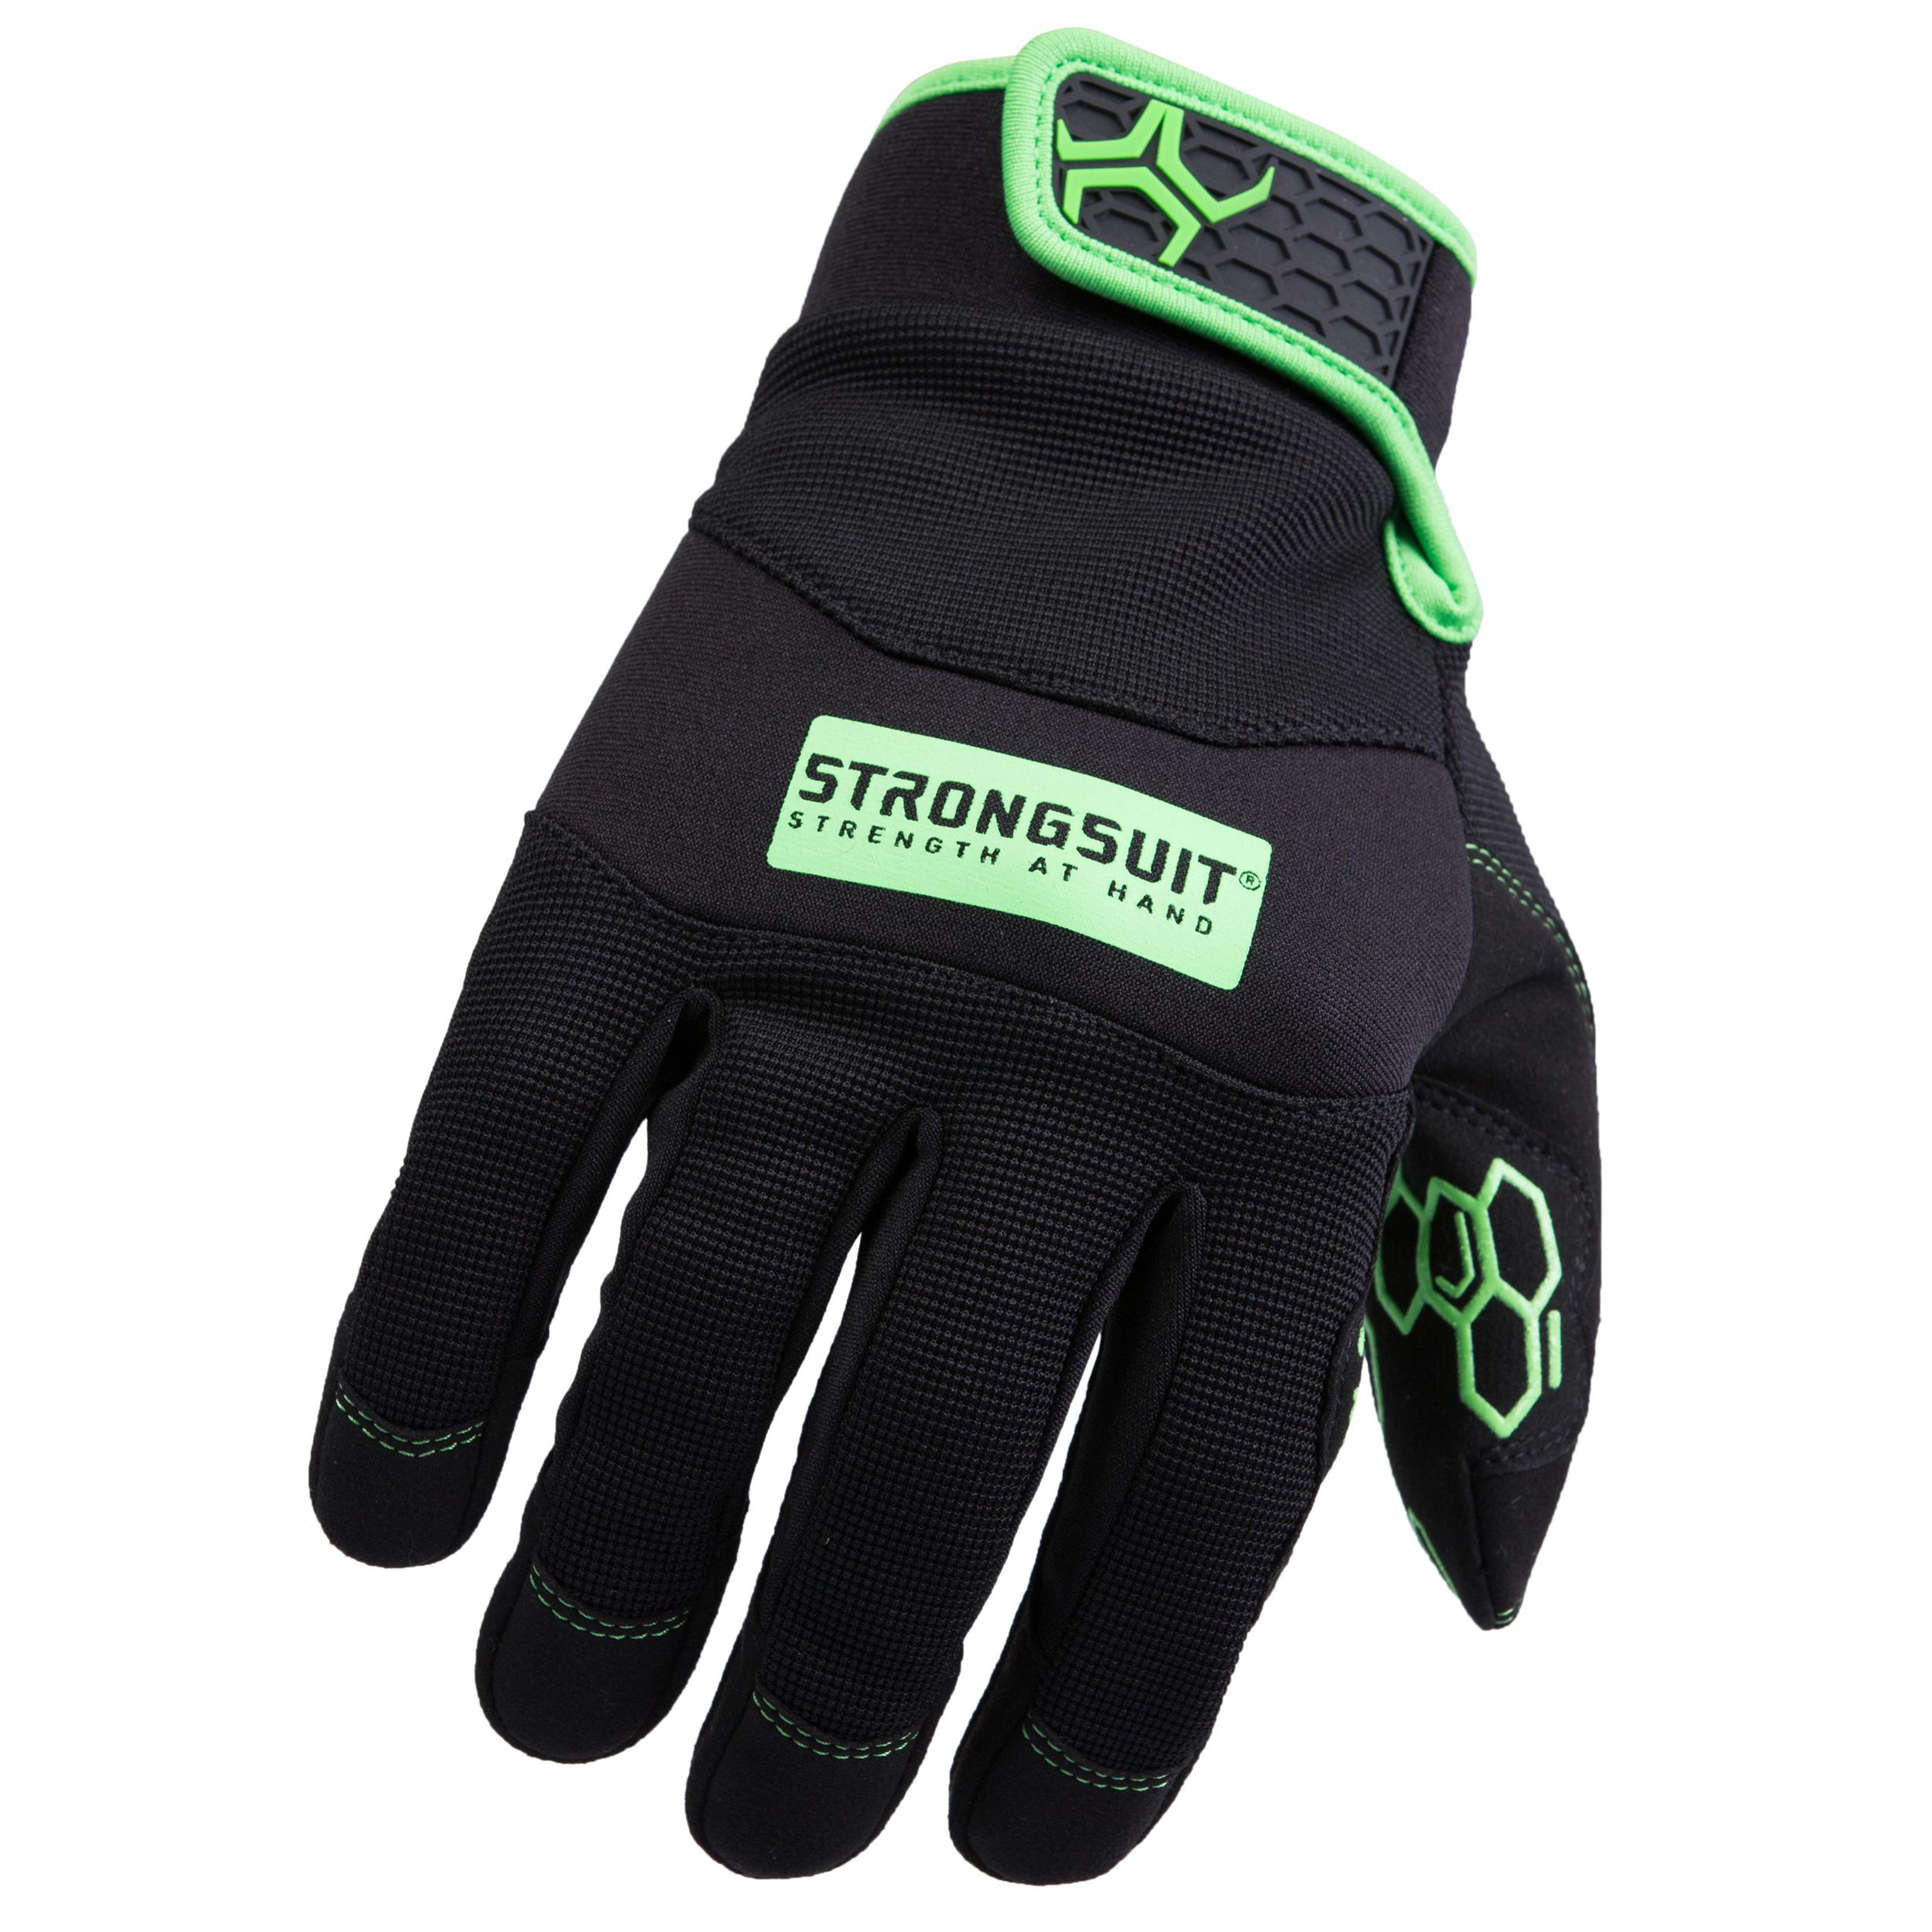 Grasper Gloves, Black/Green, XXL